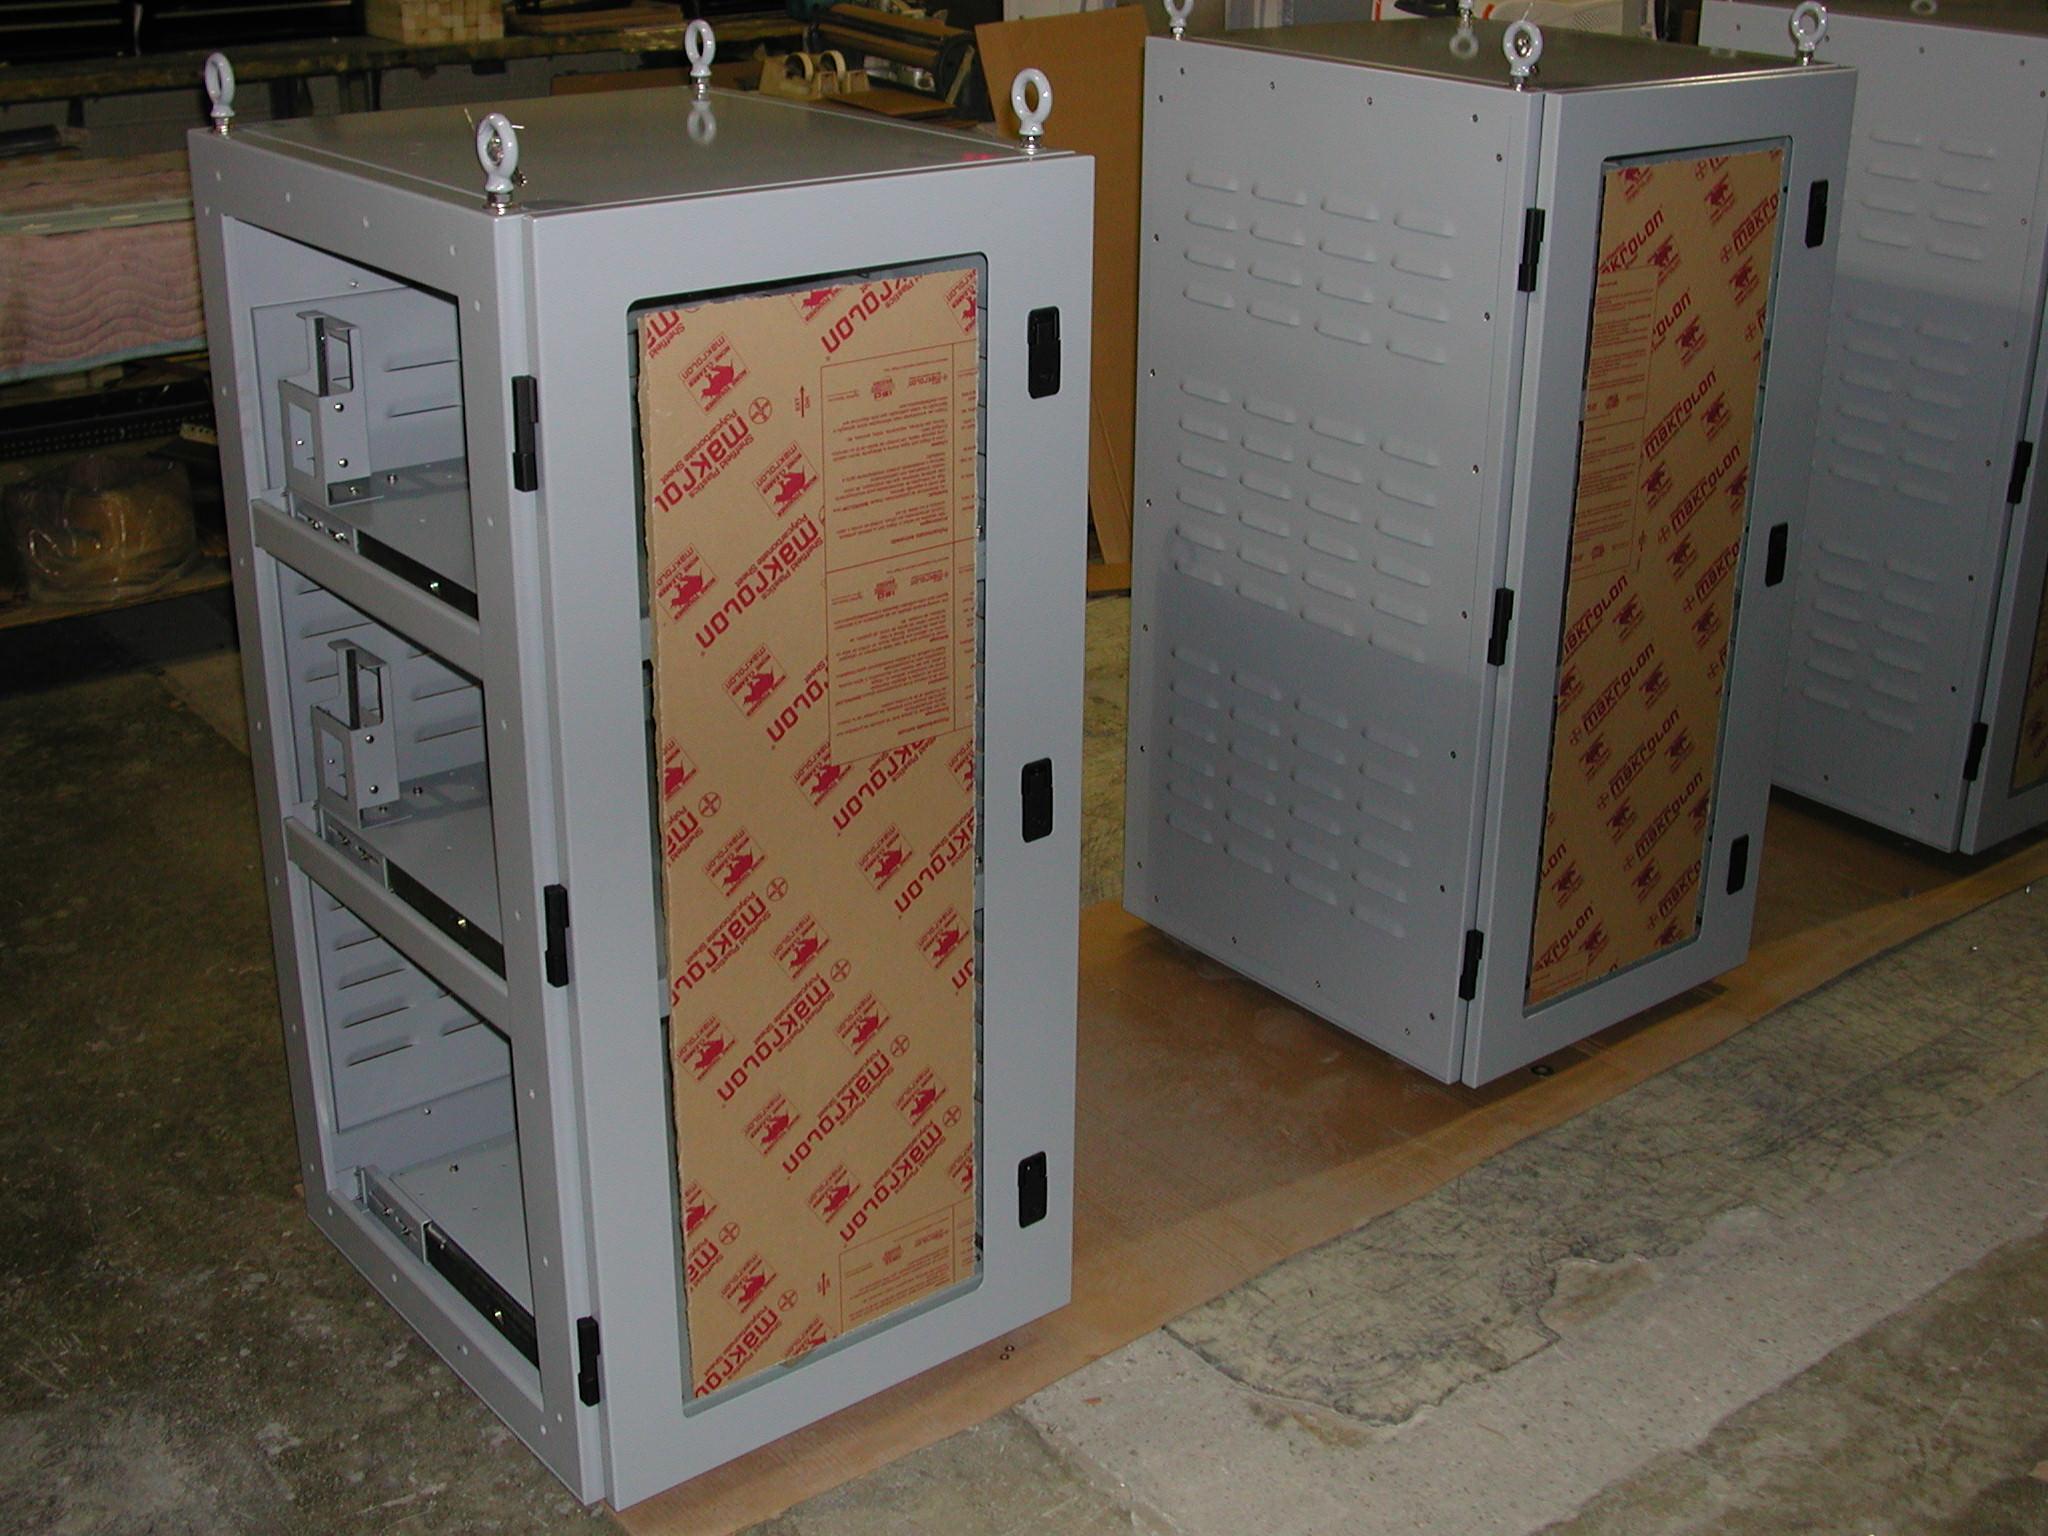 Metal Enclosures Millitary Hopewell Precision NY DSCN1630.JPG